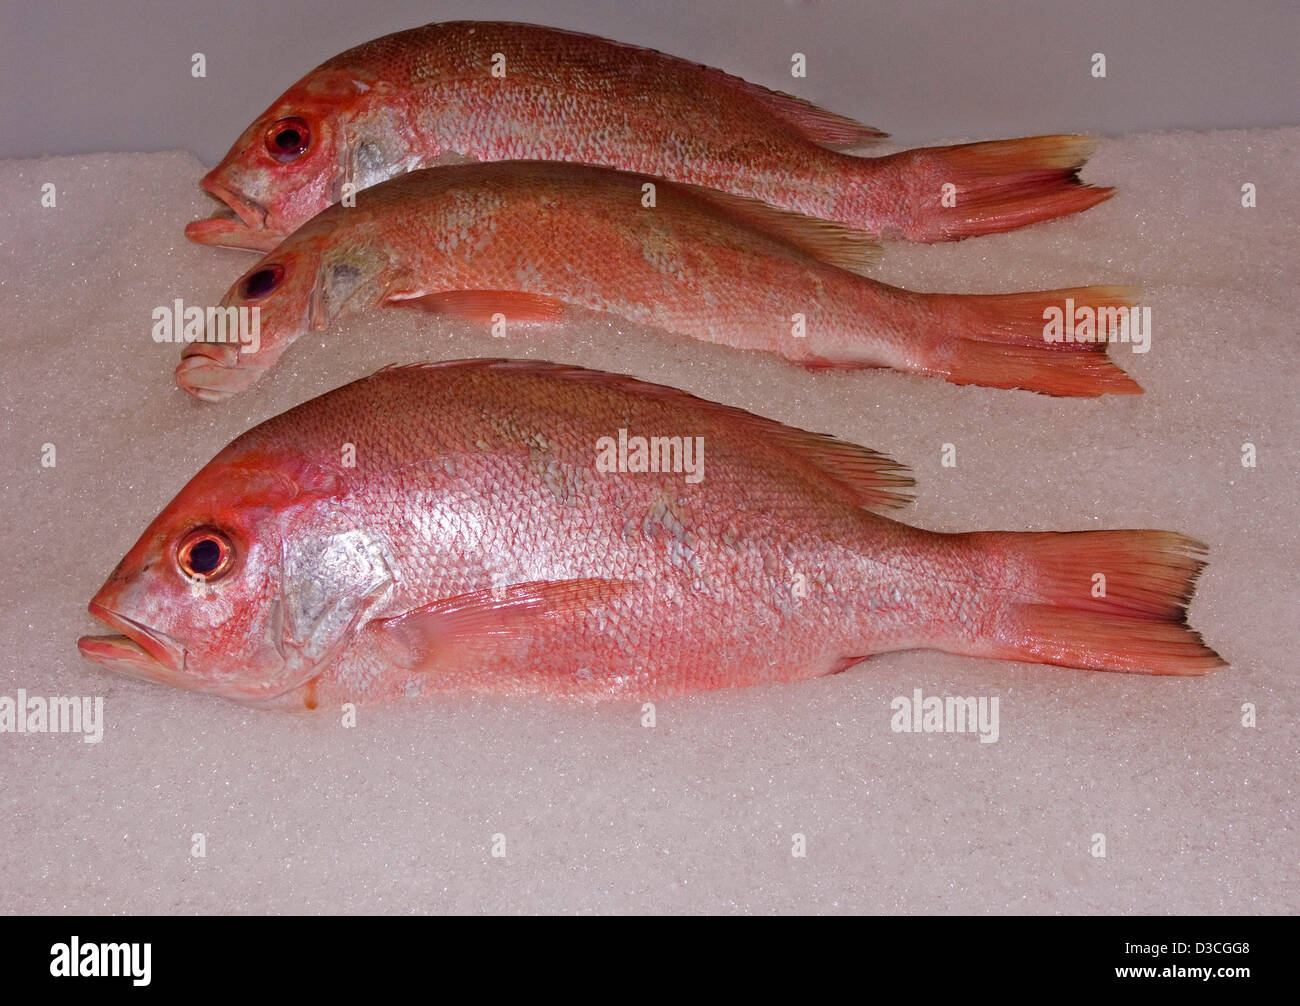 Supermarket Fish Display Stock Photos & Supermarket Fish Display ...